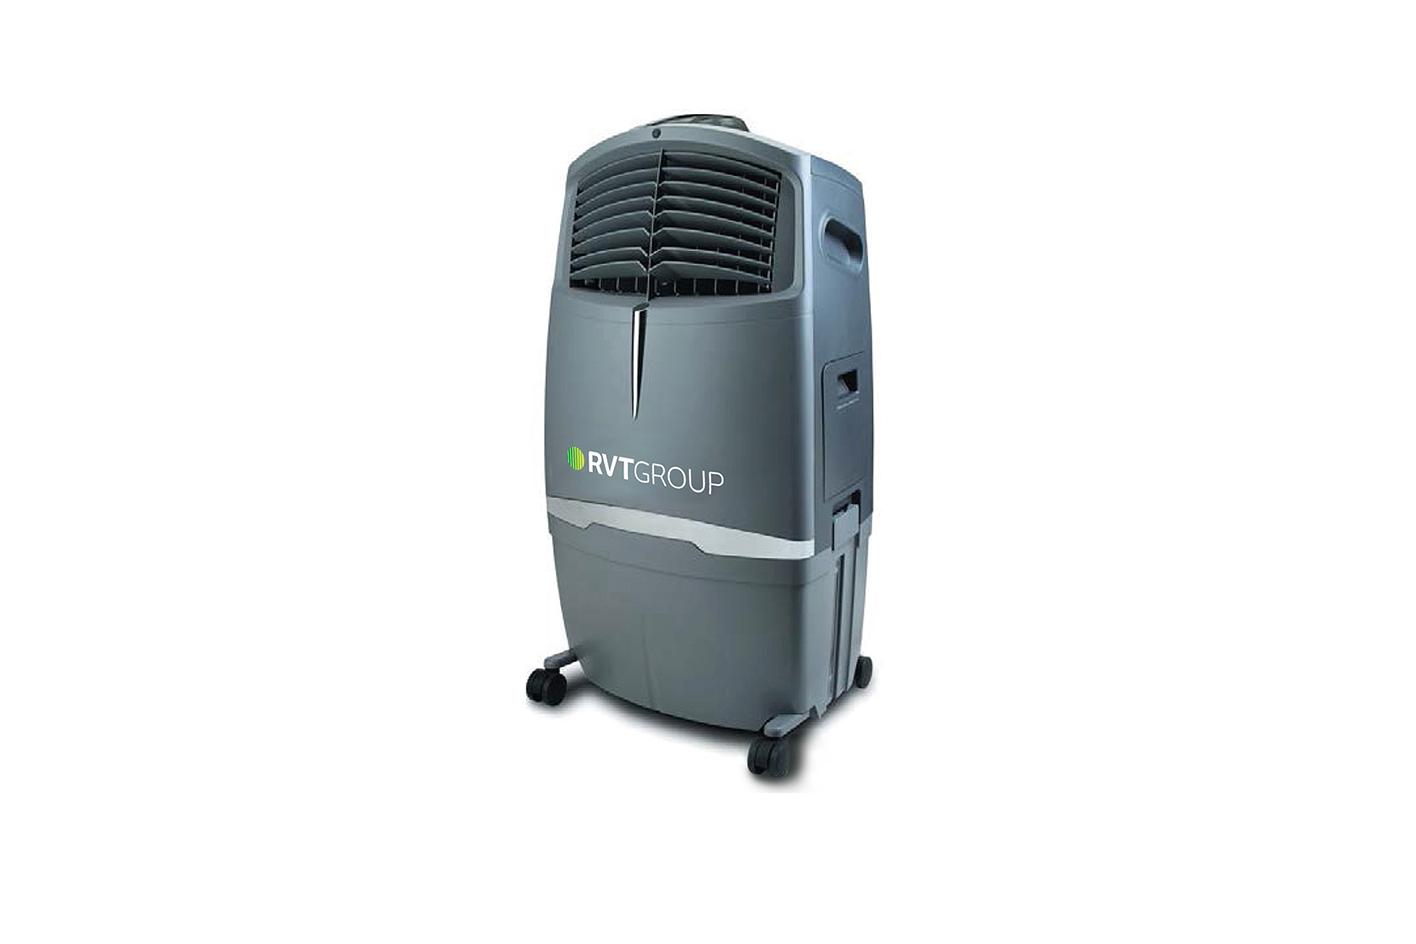 Climex Evaporative Cooler 30 web size